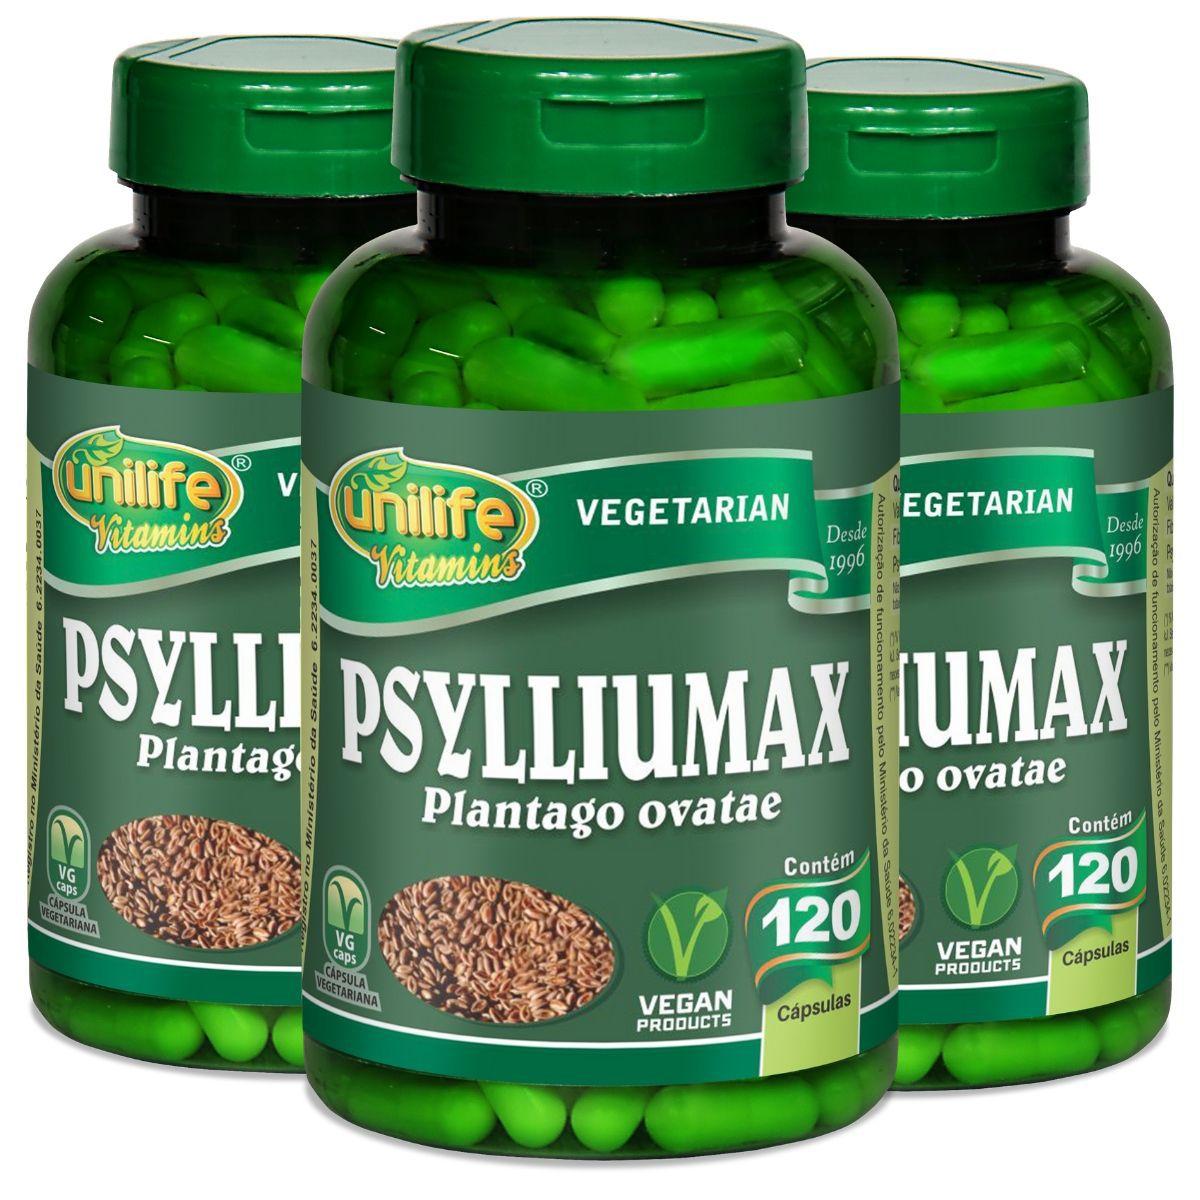 Kit 3 Psylliumax - Psyllium 550mg 120 Cápsulas - Unilife